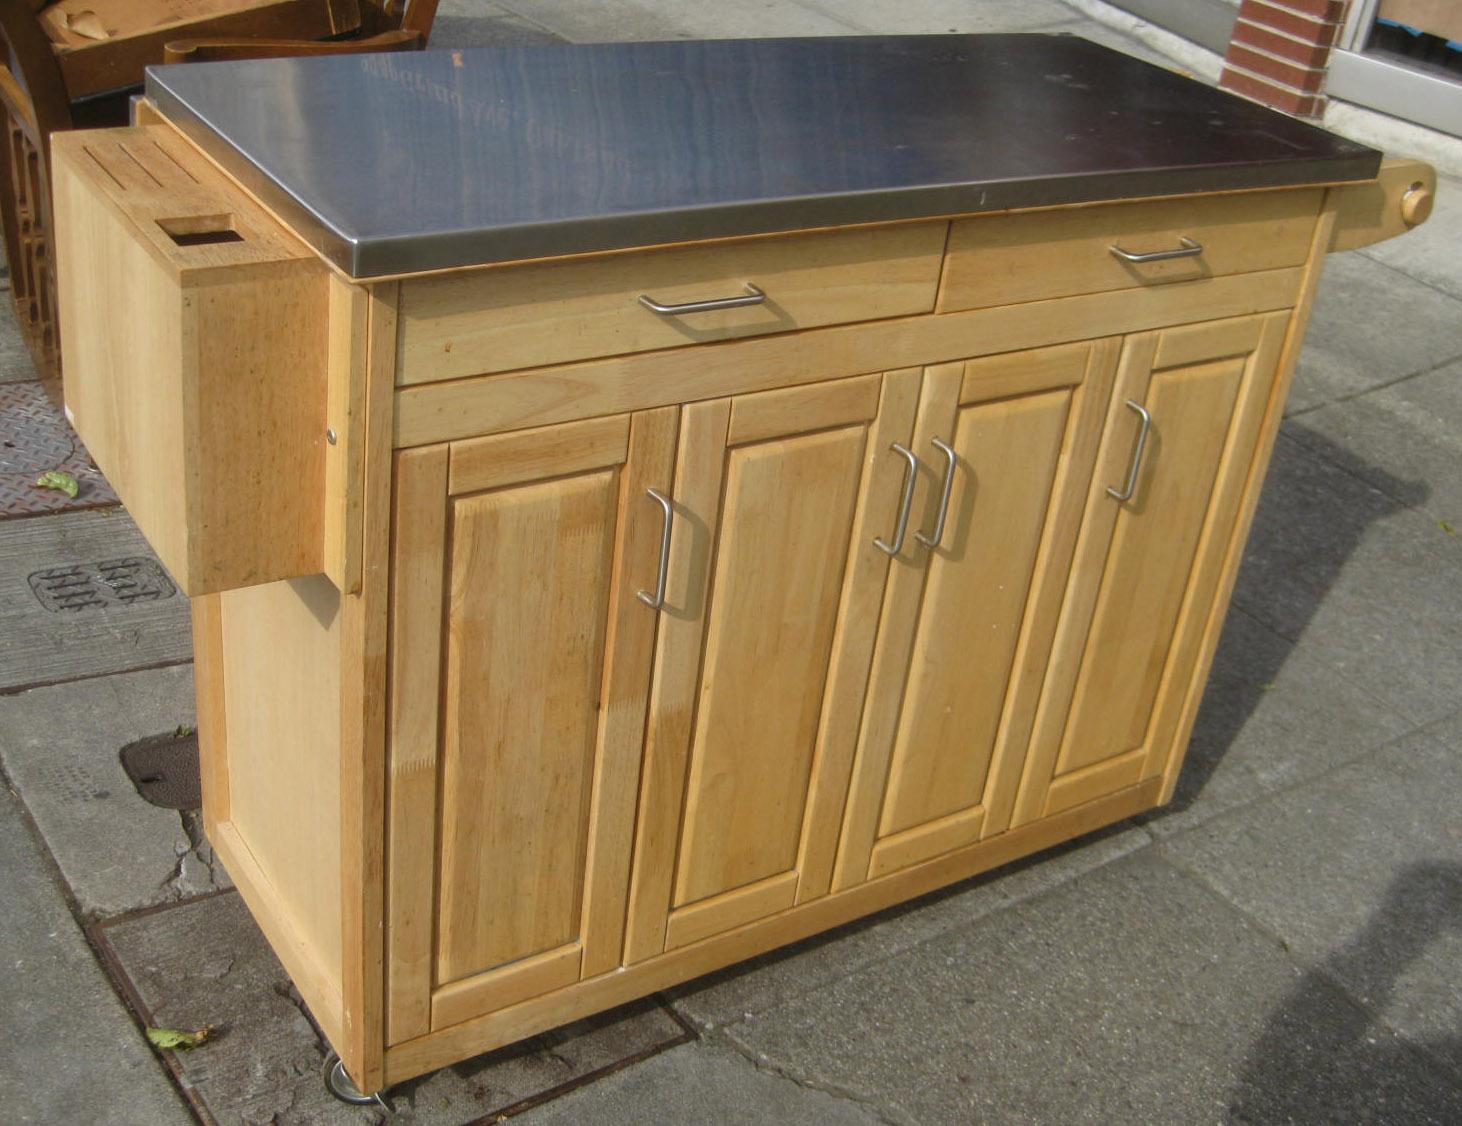 Uhuru Furniture Amp Collectibles Sold Mobile Kitchen